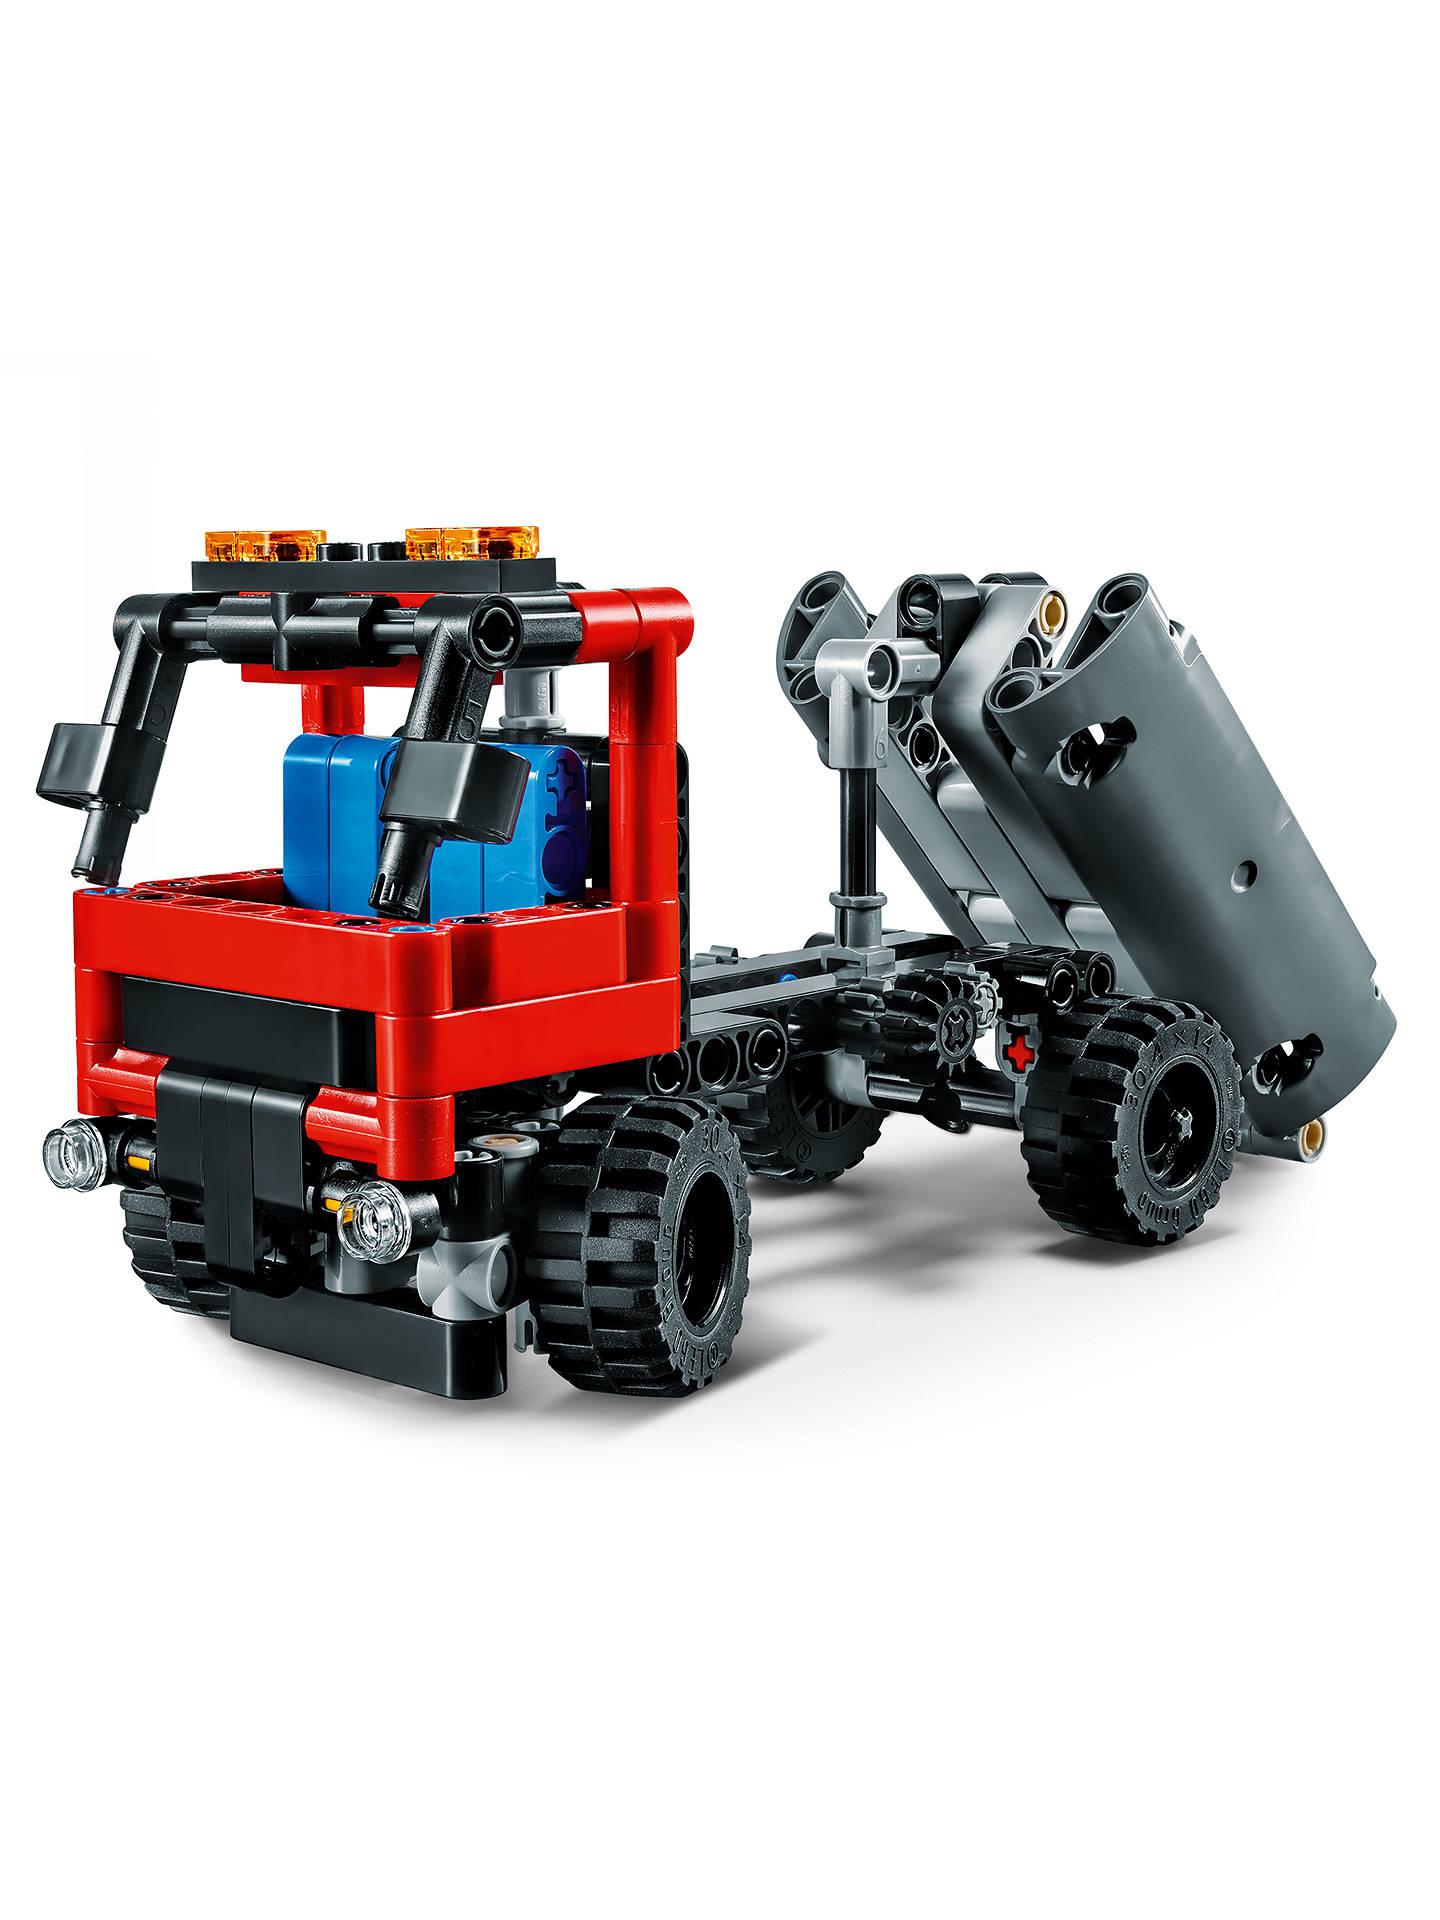 LEGO Technic Hook Loader 42084 2018 Version Free Shipping